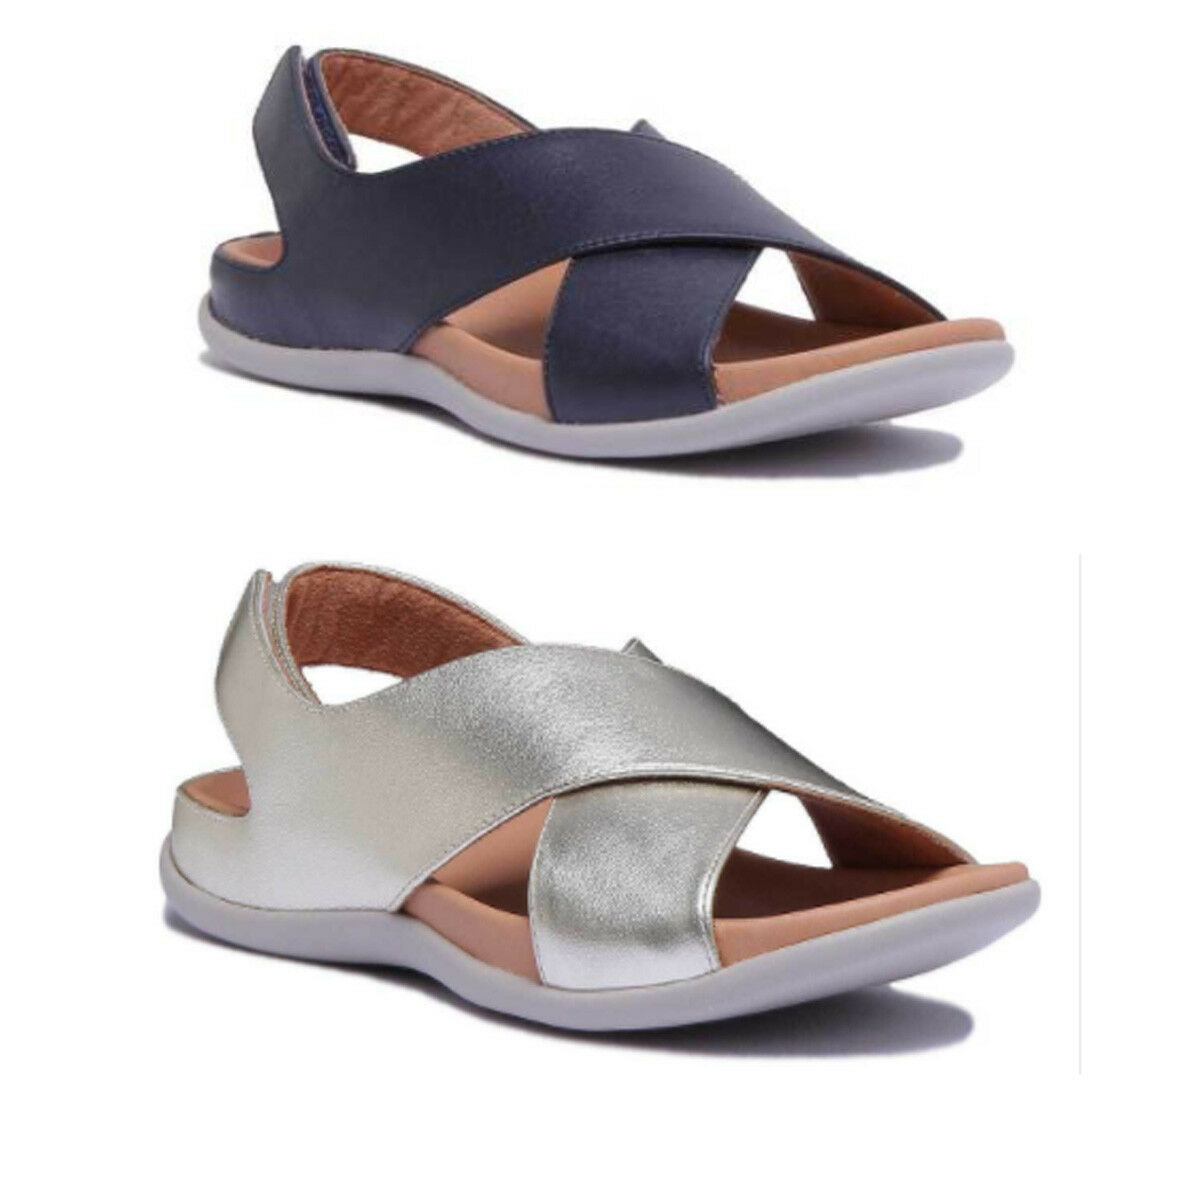 Strive Venice Women Leather Matt Navy Cross Straps Sandals Size UK 3 - 8